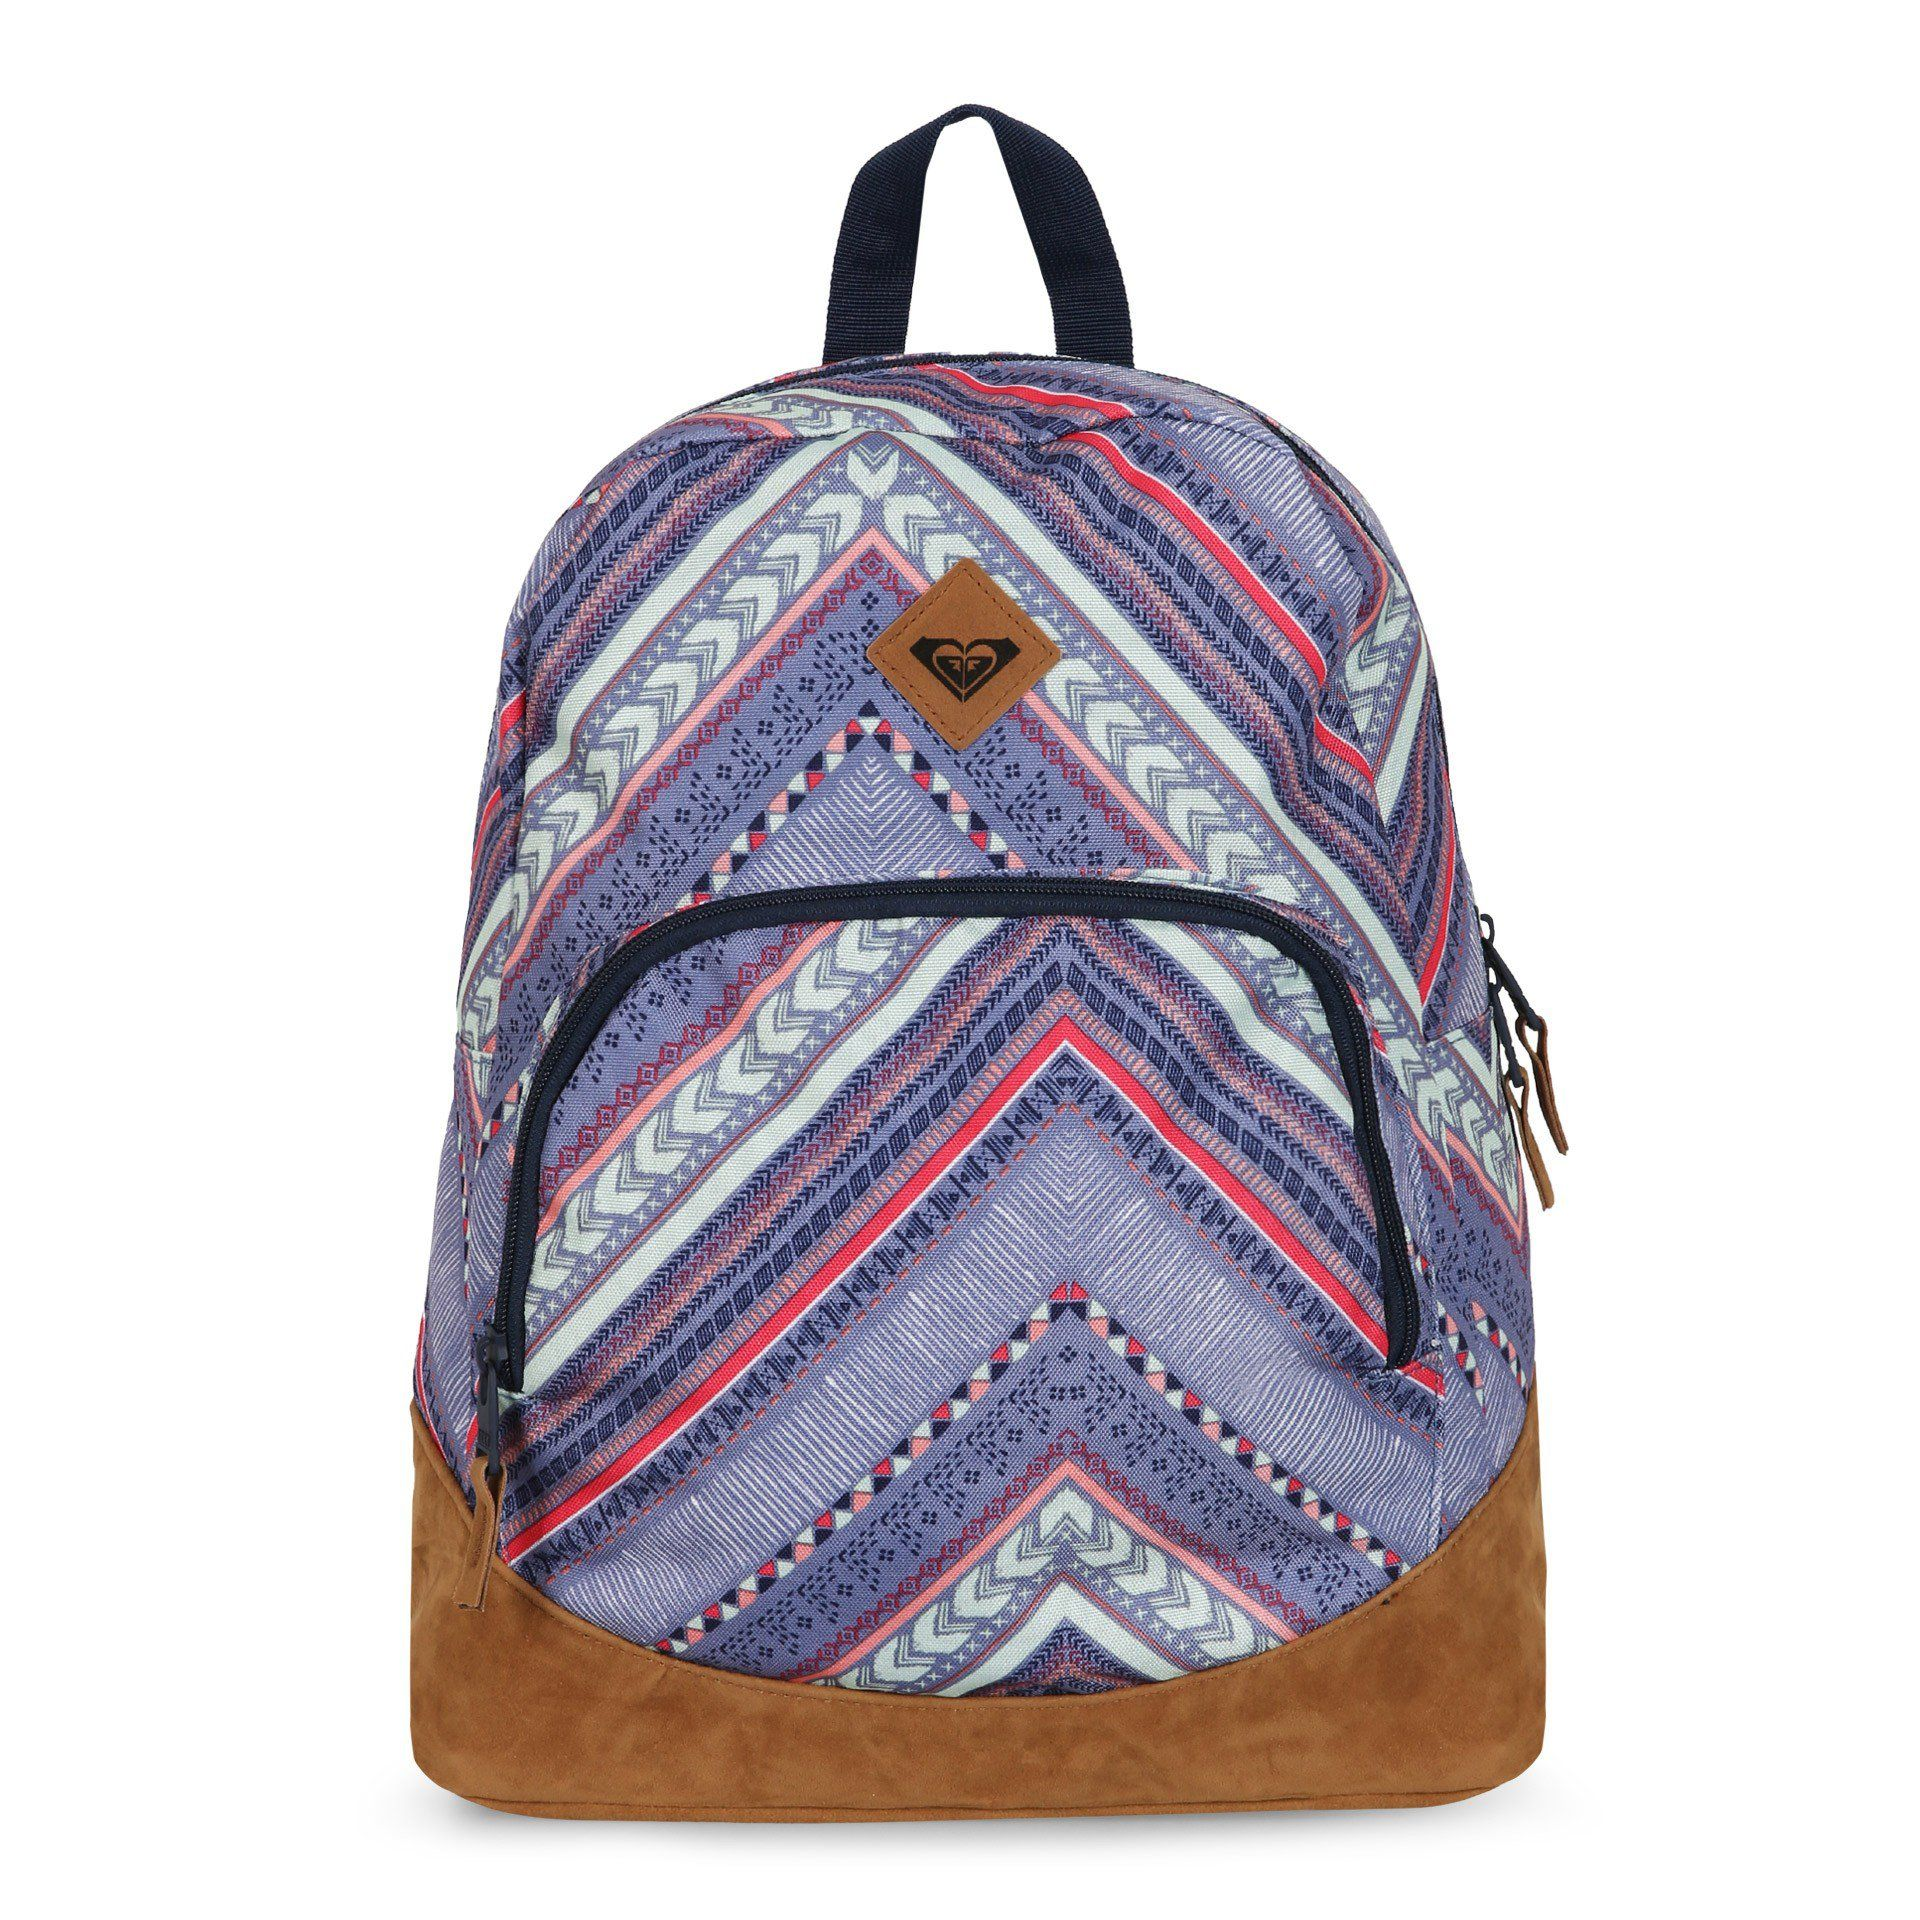 c9cd0794e5 Sac à dos Fairness Roxy | Back to School | Roxy backpacks, School ...